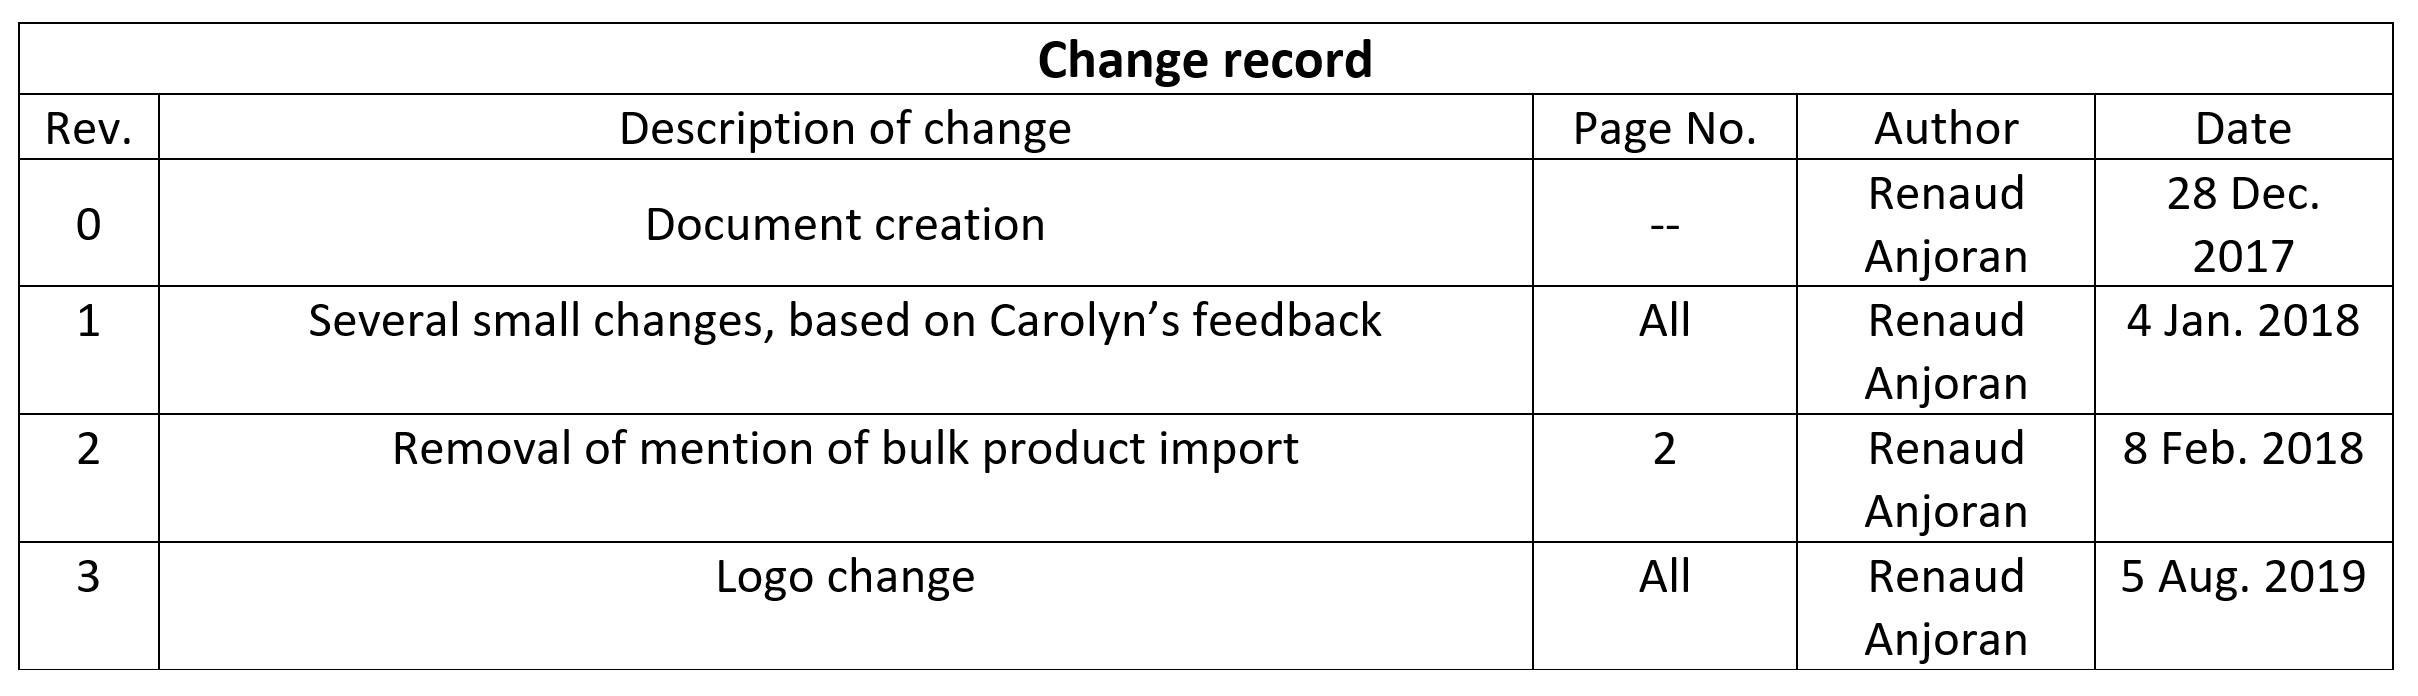 change record